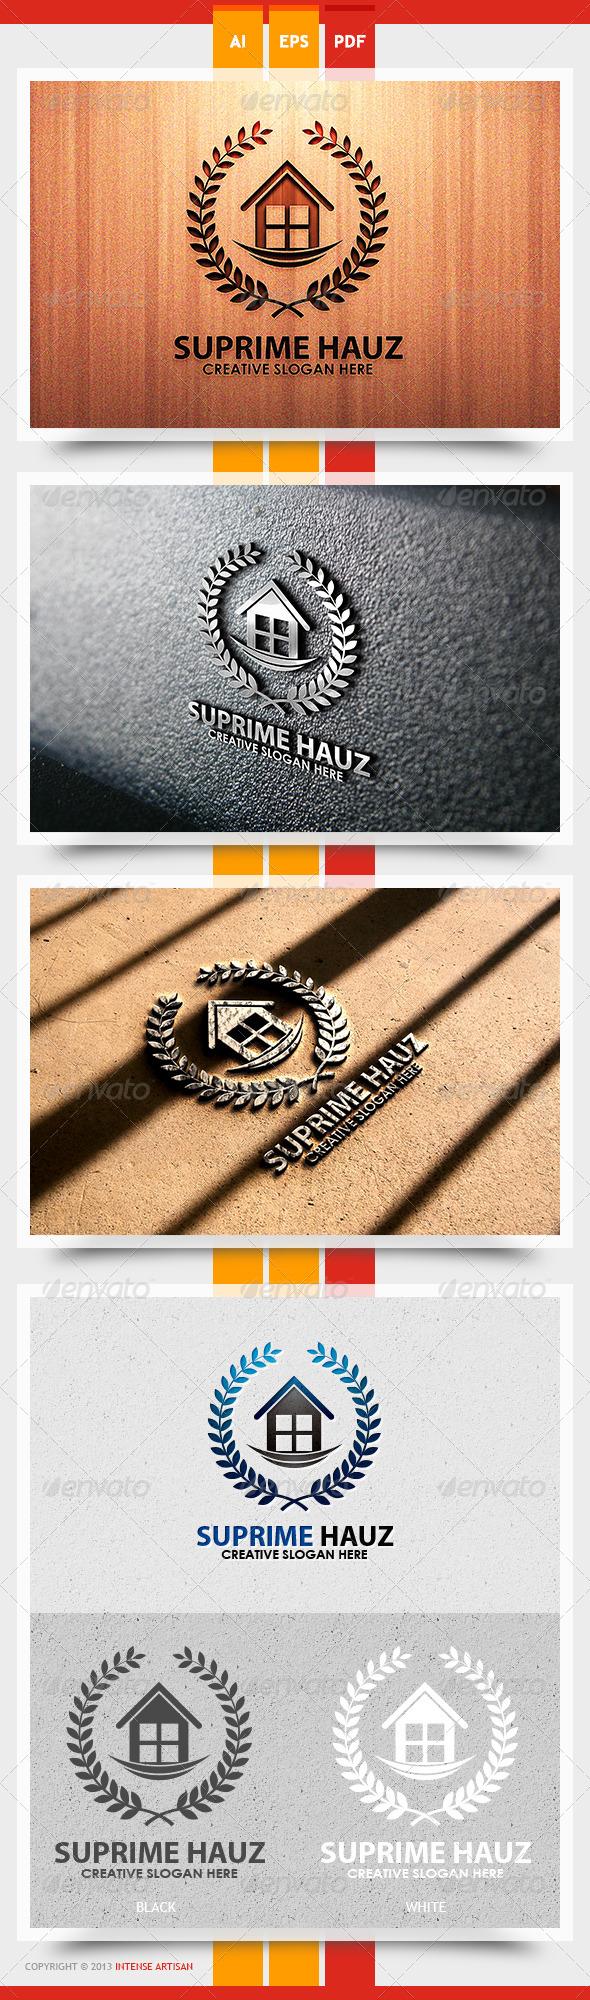 Supreme Hauz Logo Template